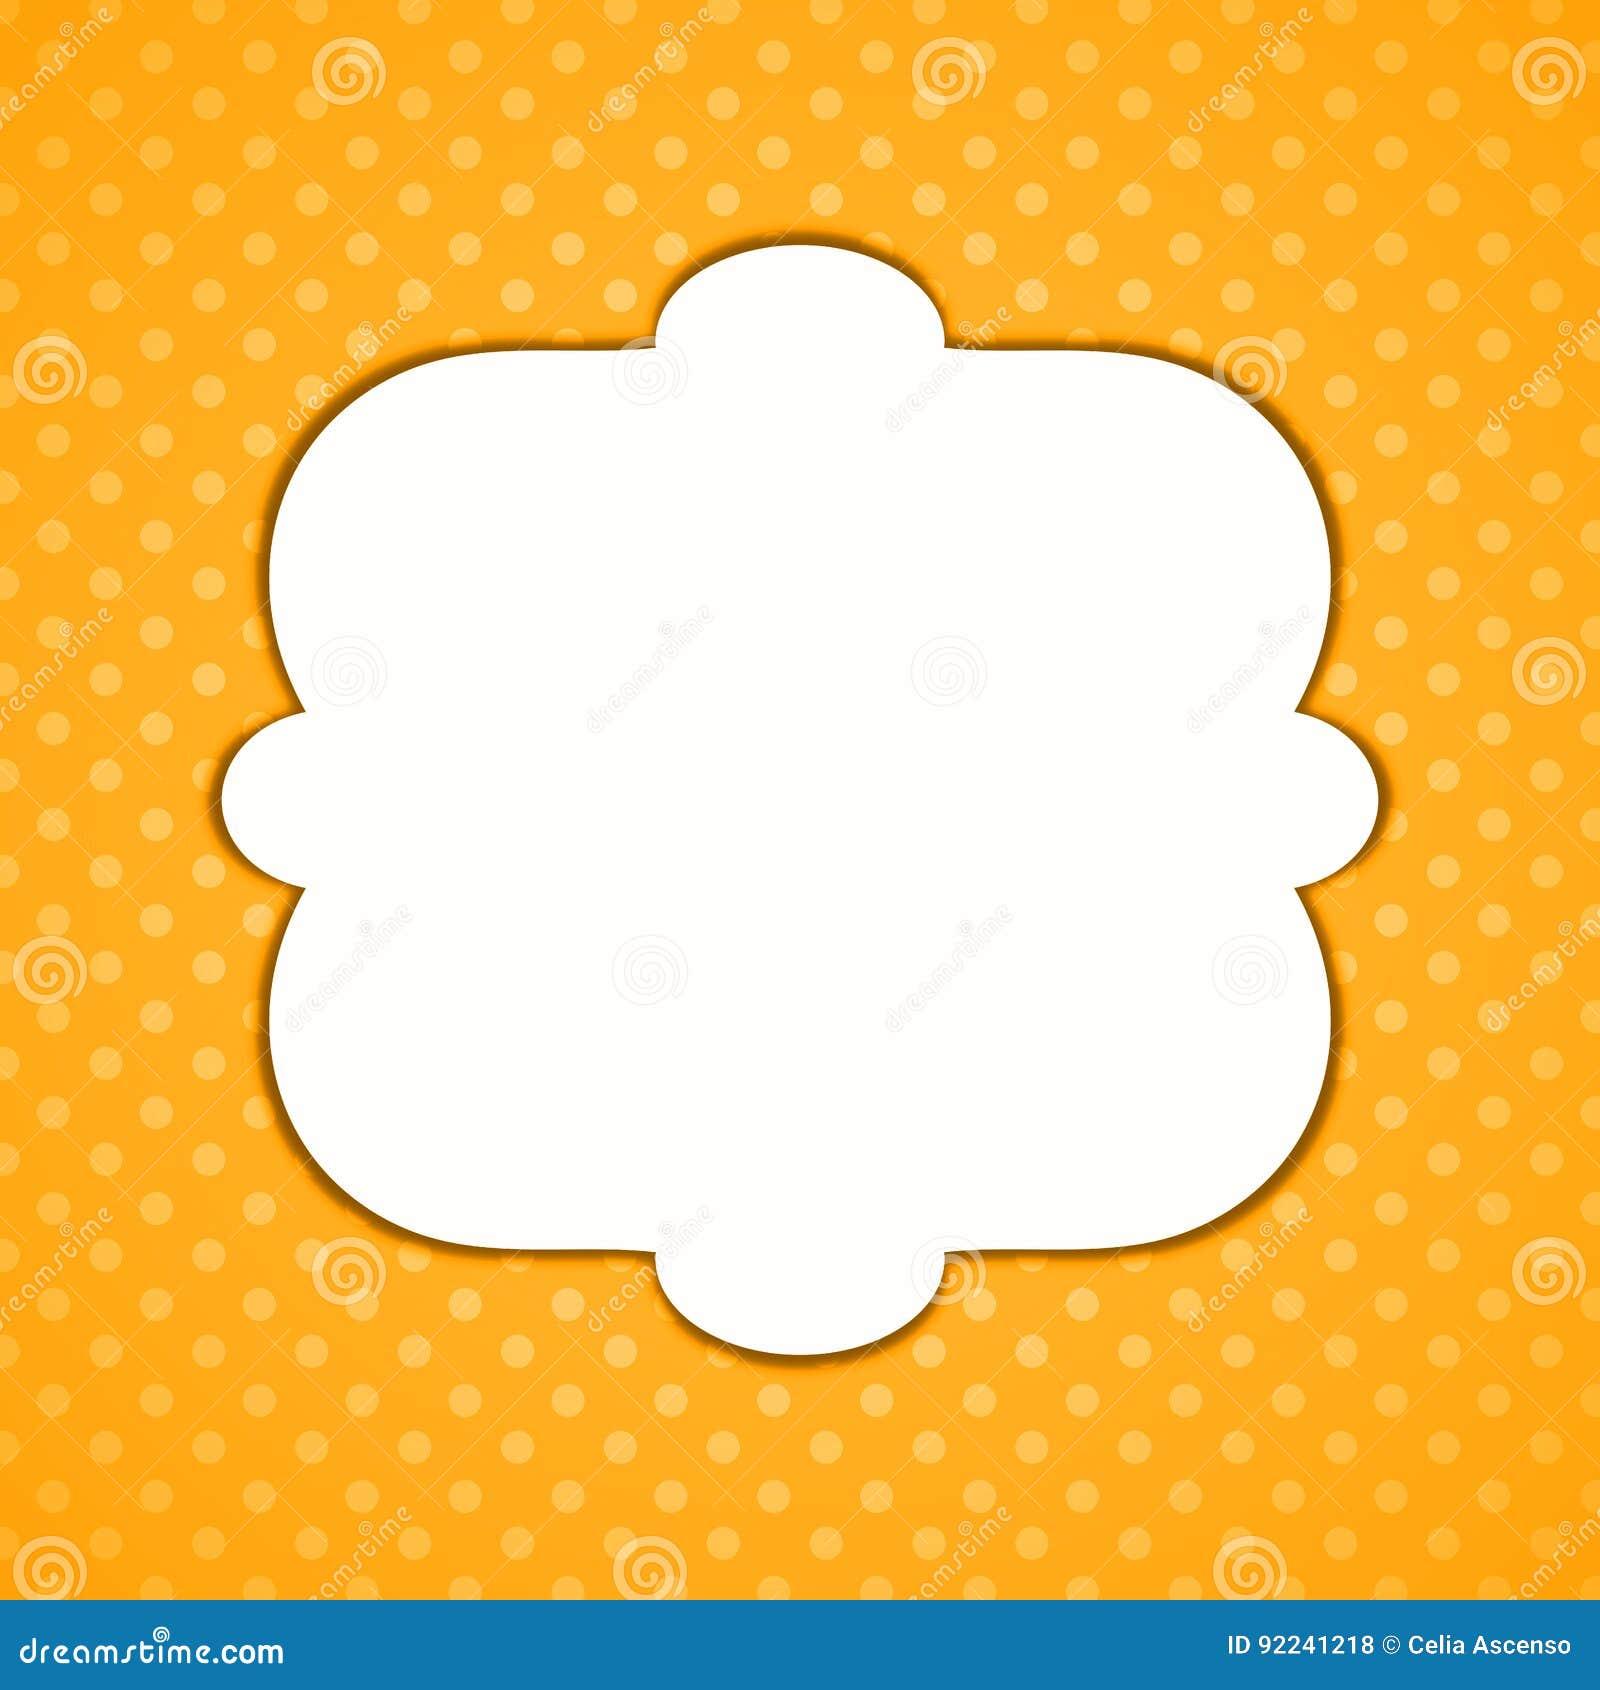 Halloween polka dots border frame